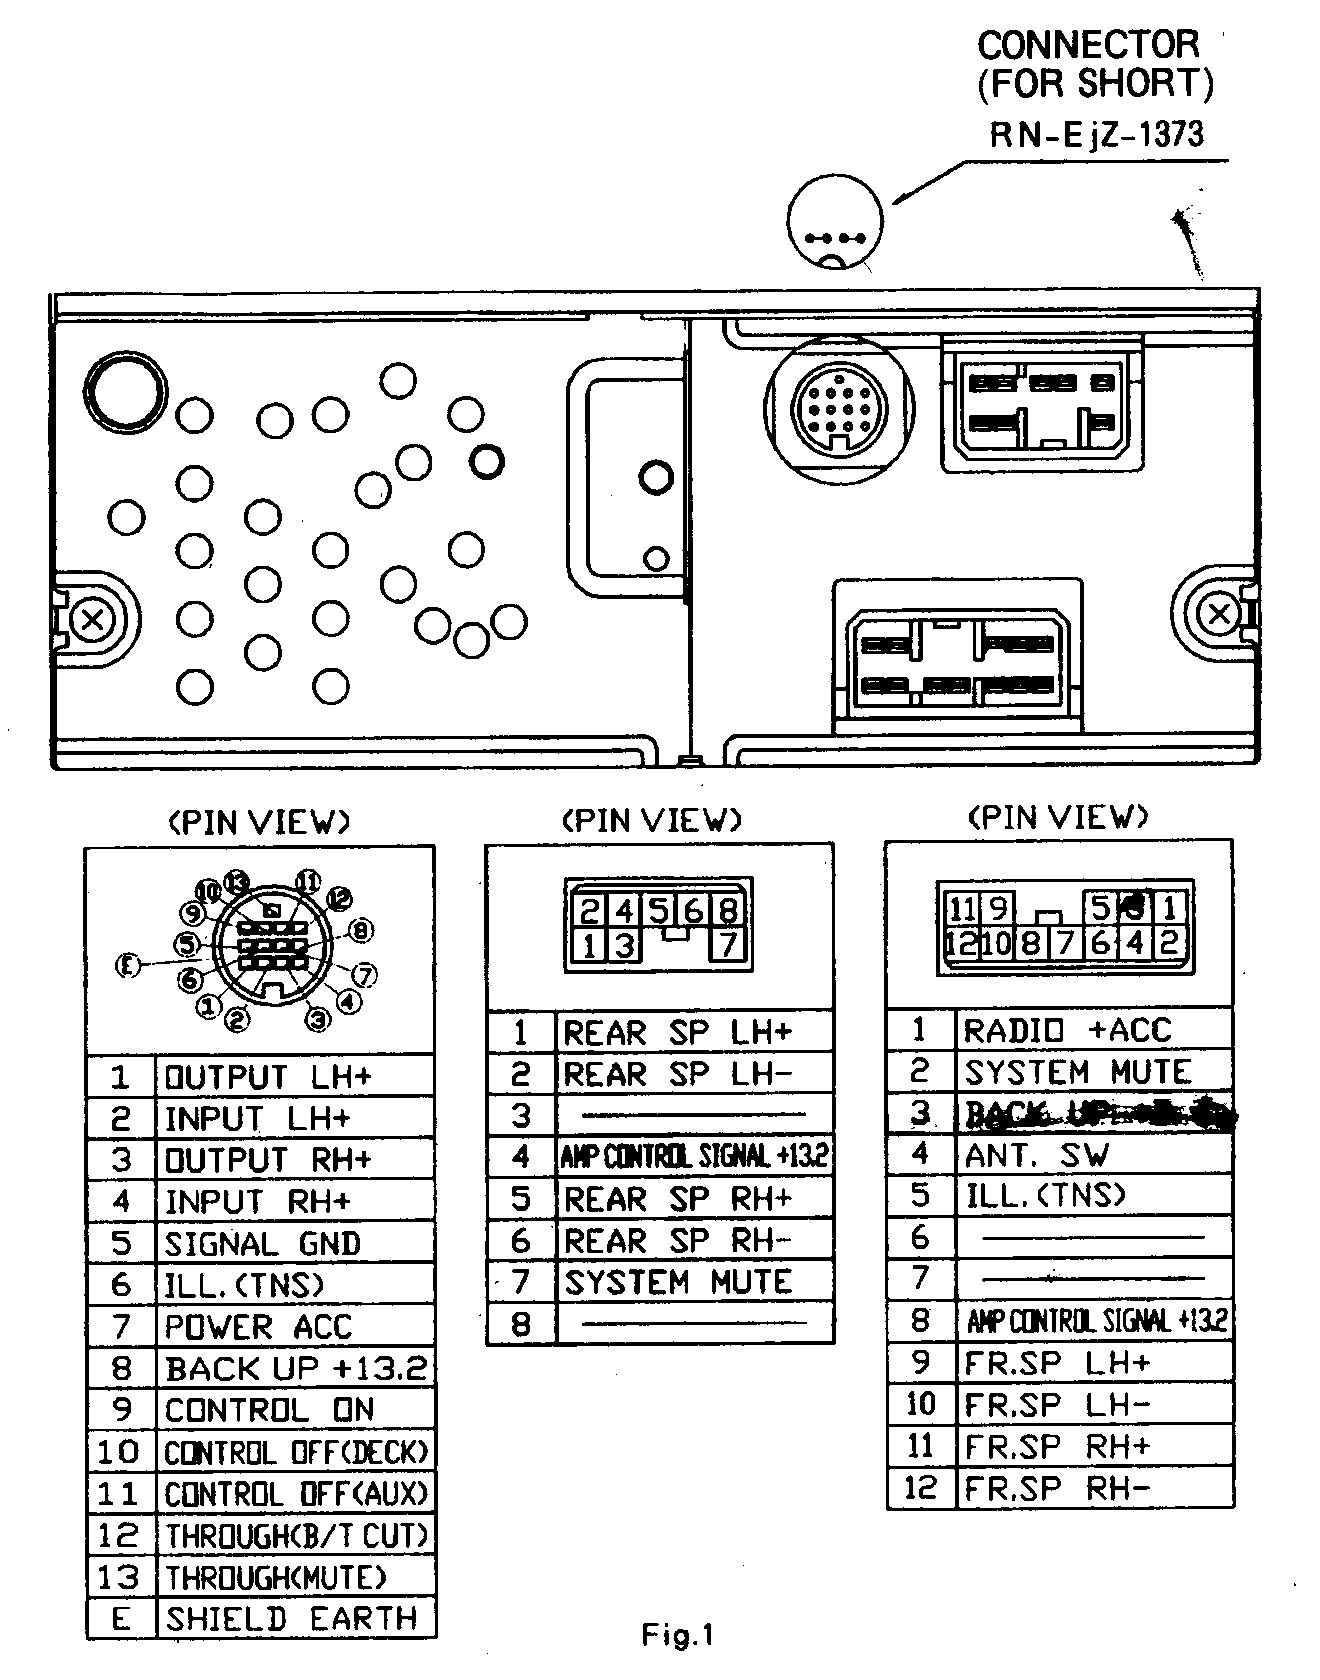 2002 Mazda Mpv Radio Wiring Diagram Data Circuit 2000 Engine Firing And Hub U2022 Rh Bdnewsmix Com Cooling System